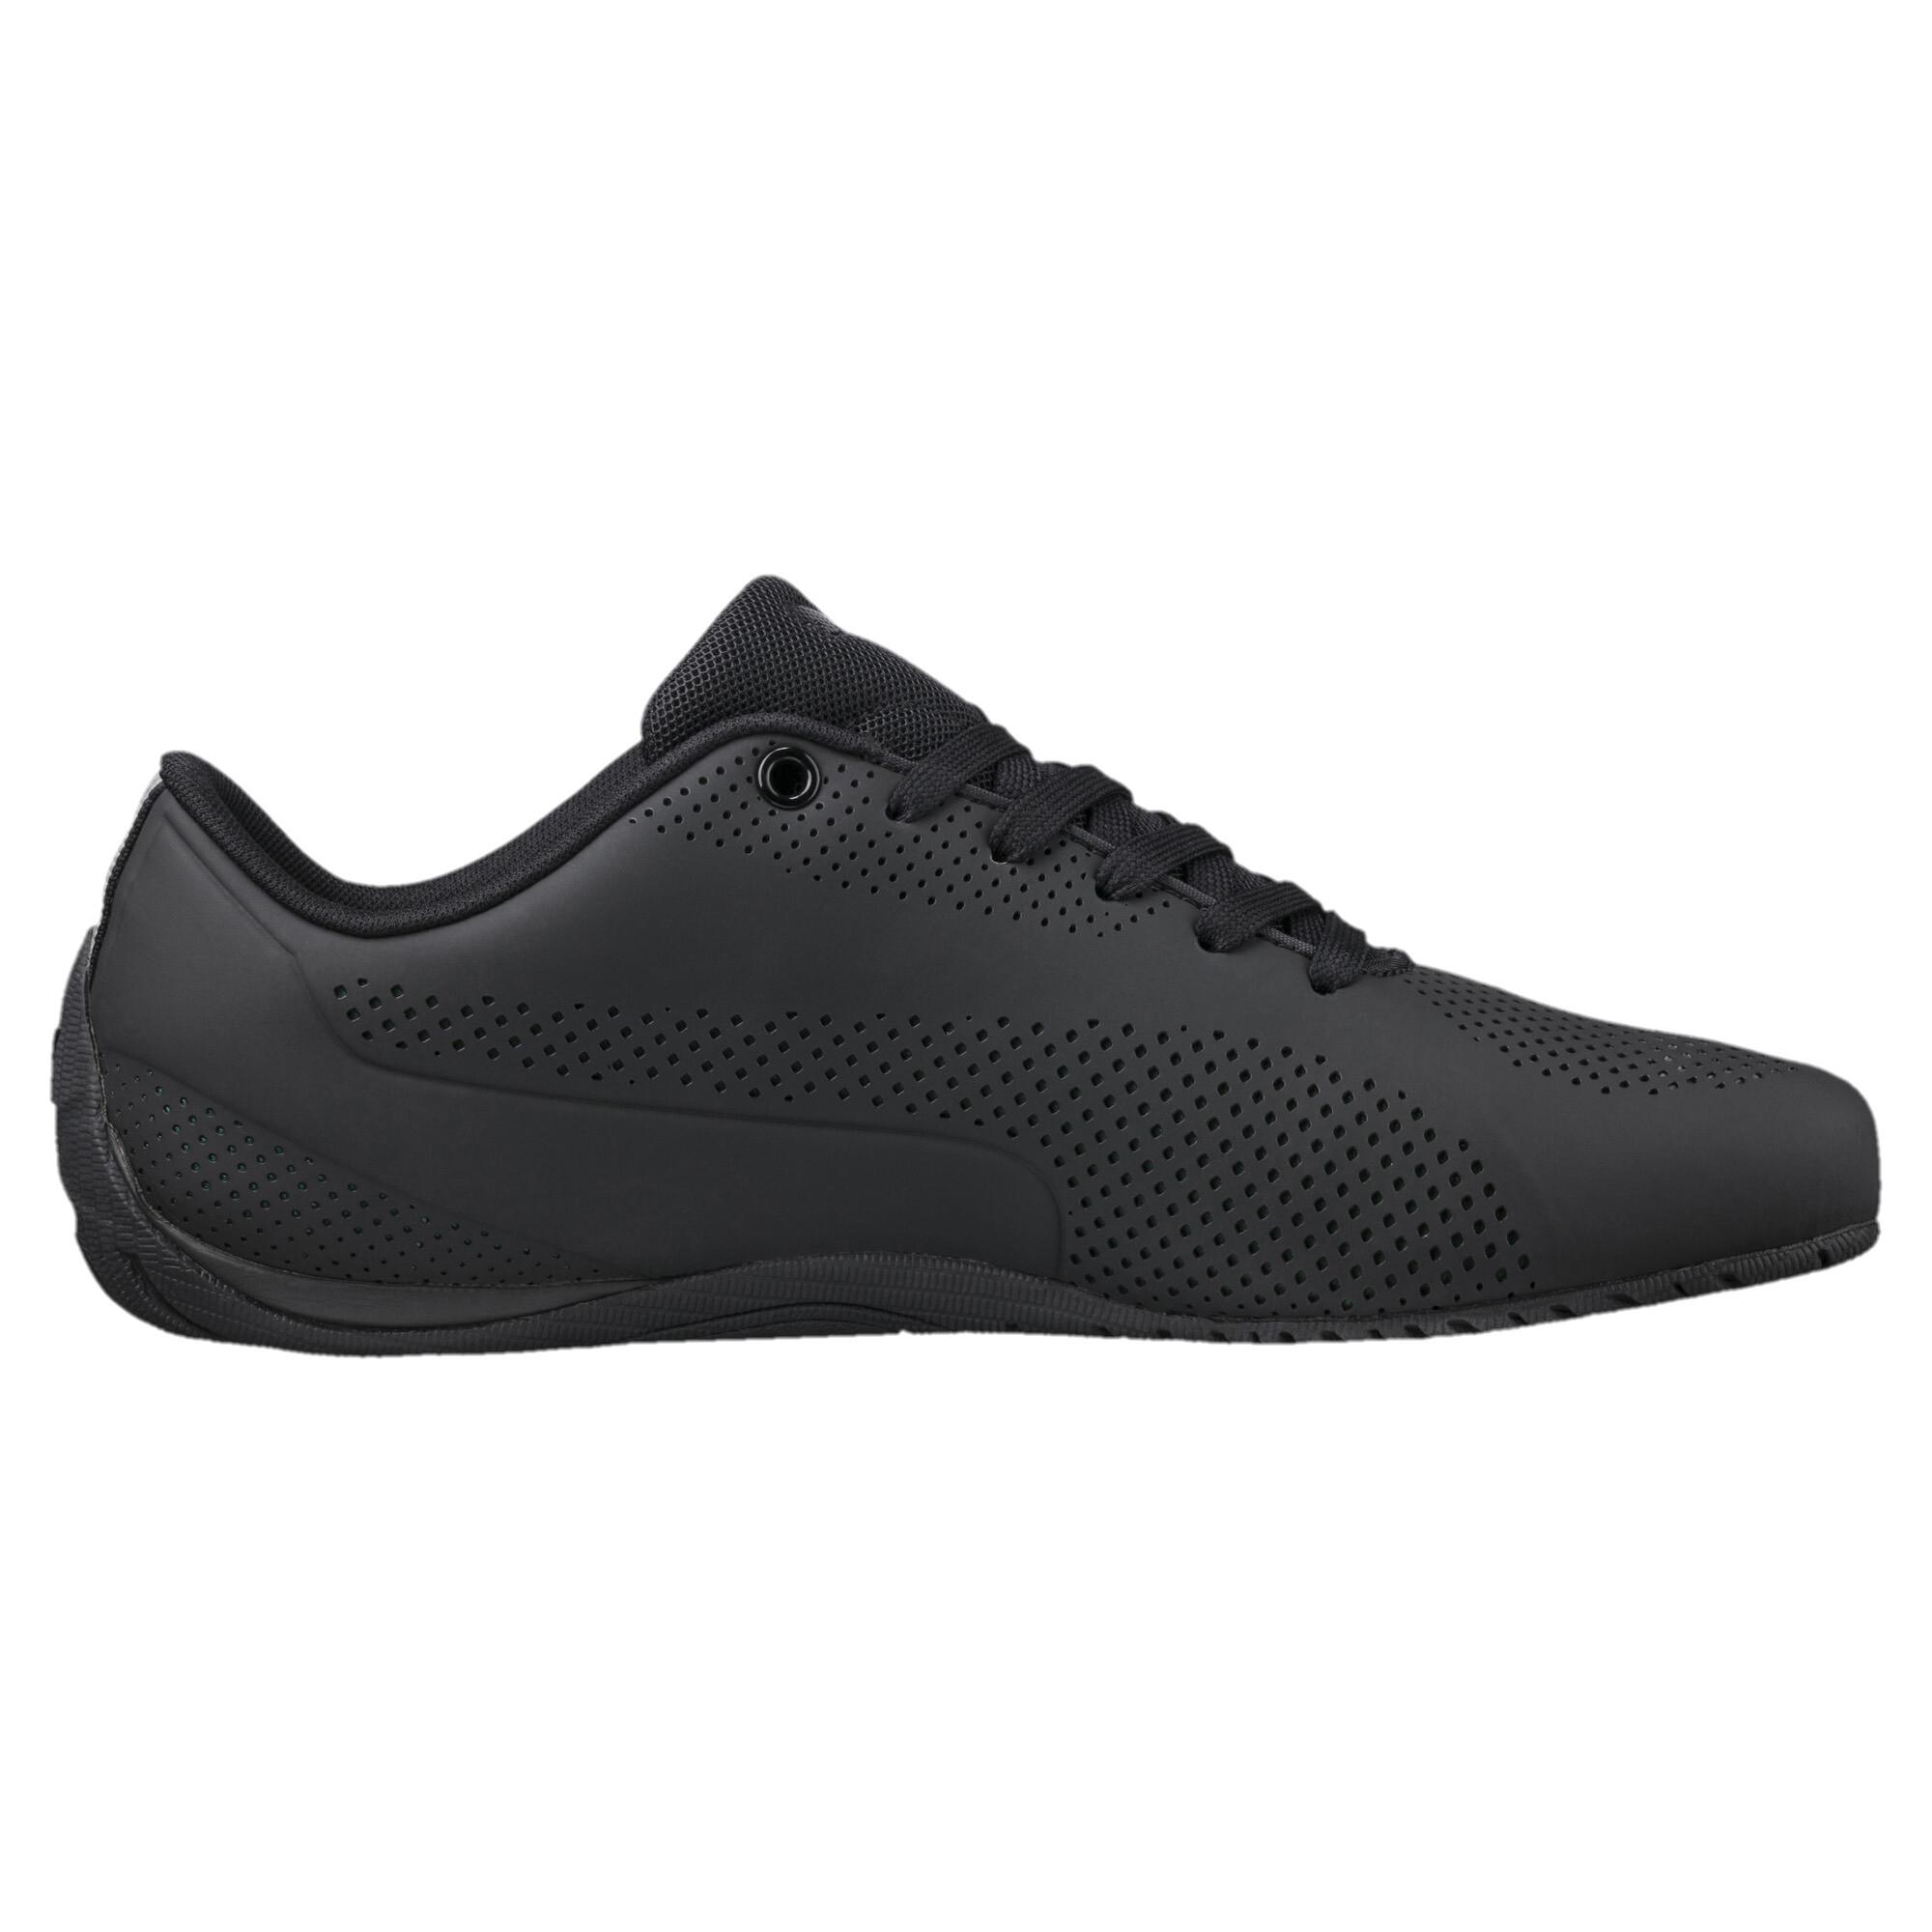 PUMA-Men-039-s-Drift-Cat-Ultra-Reflective-Shoes thumbnail 5